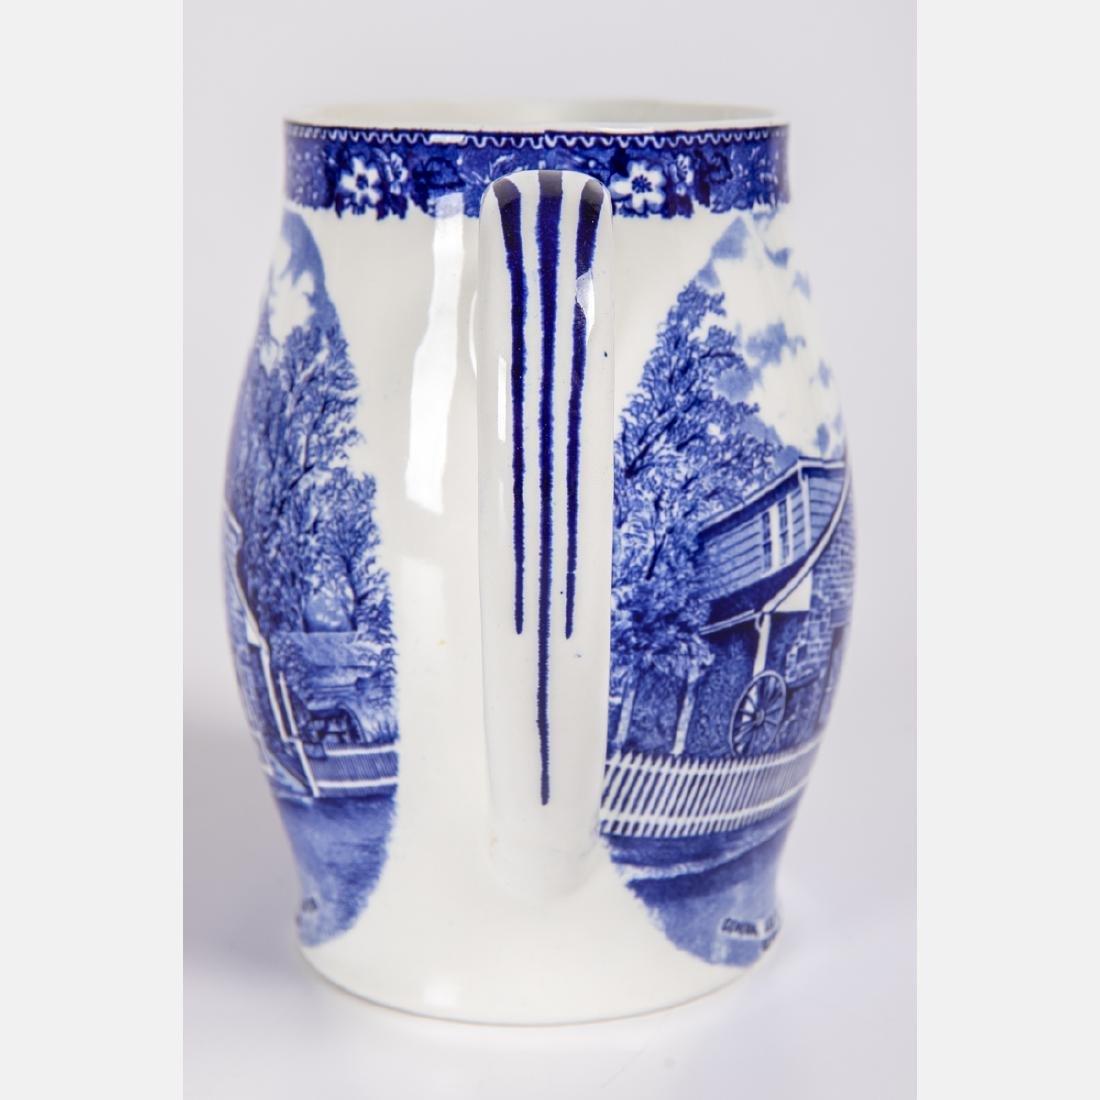 Two Staffordshire Pottery Civil War Themed Mug and - 2